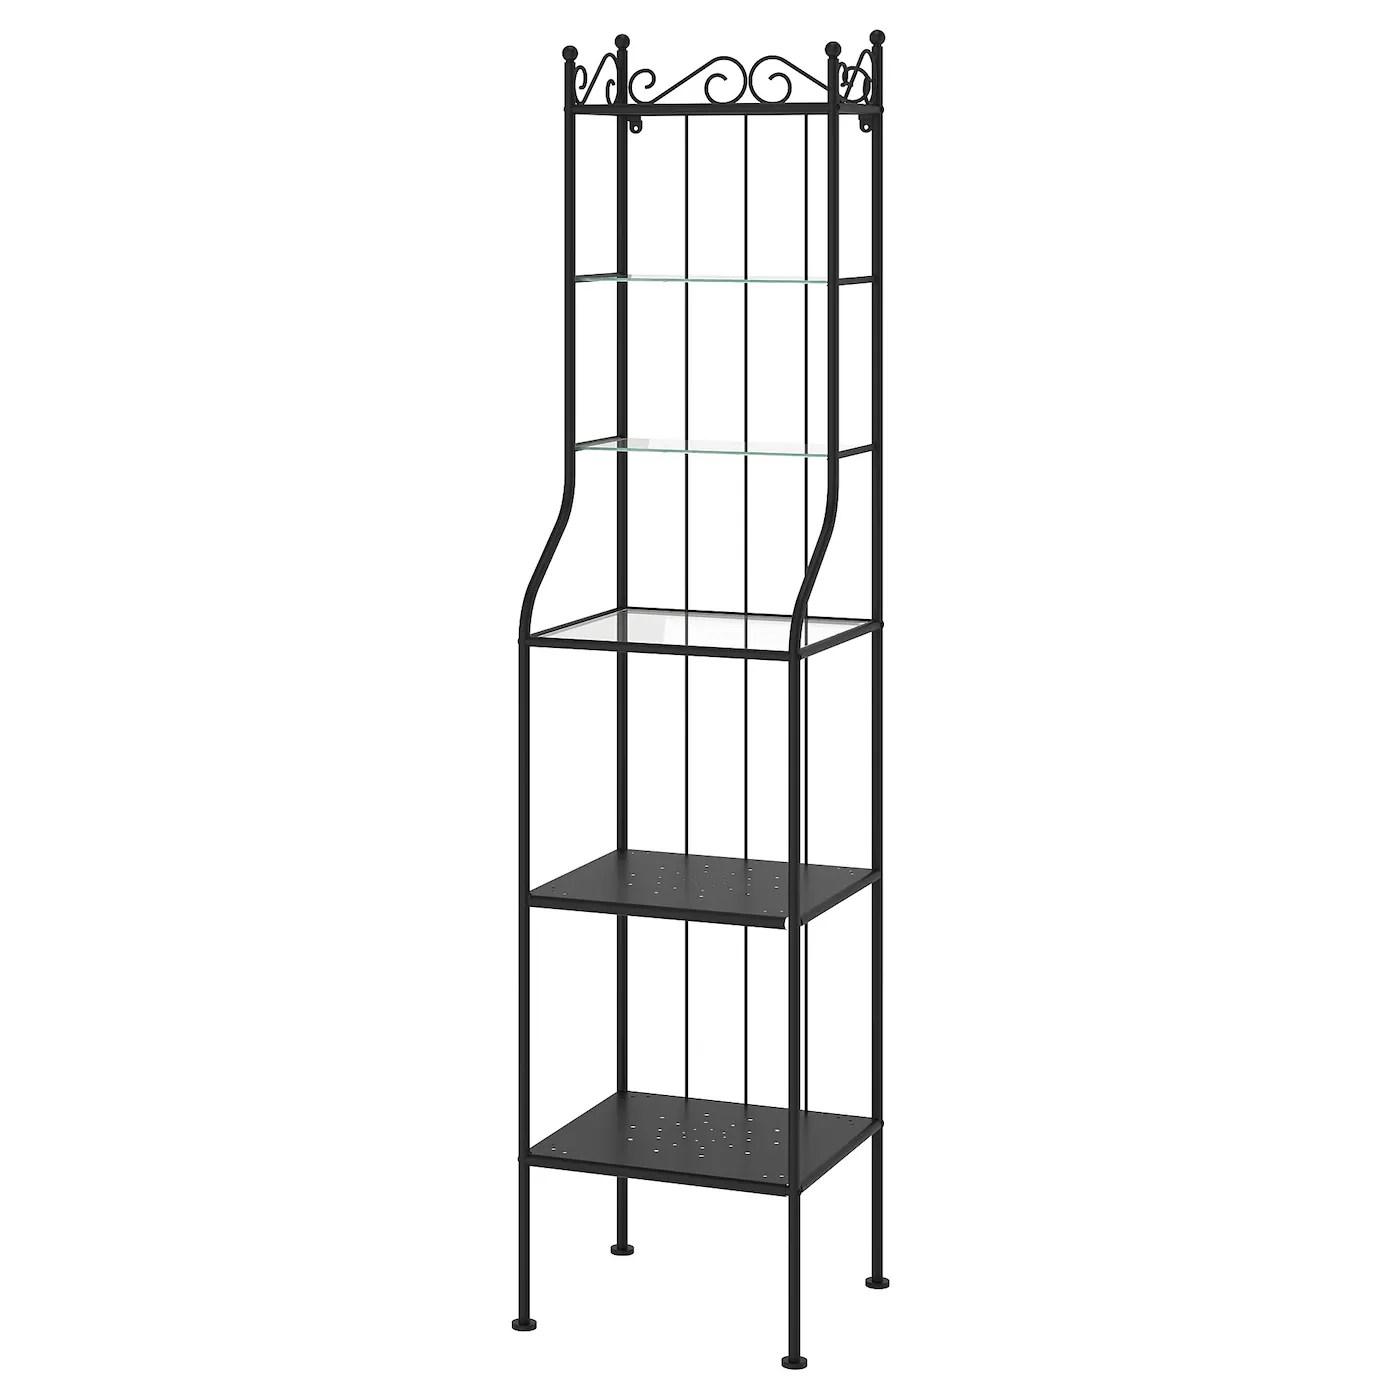 Ronnskar Etagere Noir 42x176 Cm Ikea